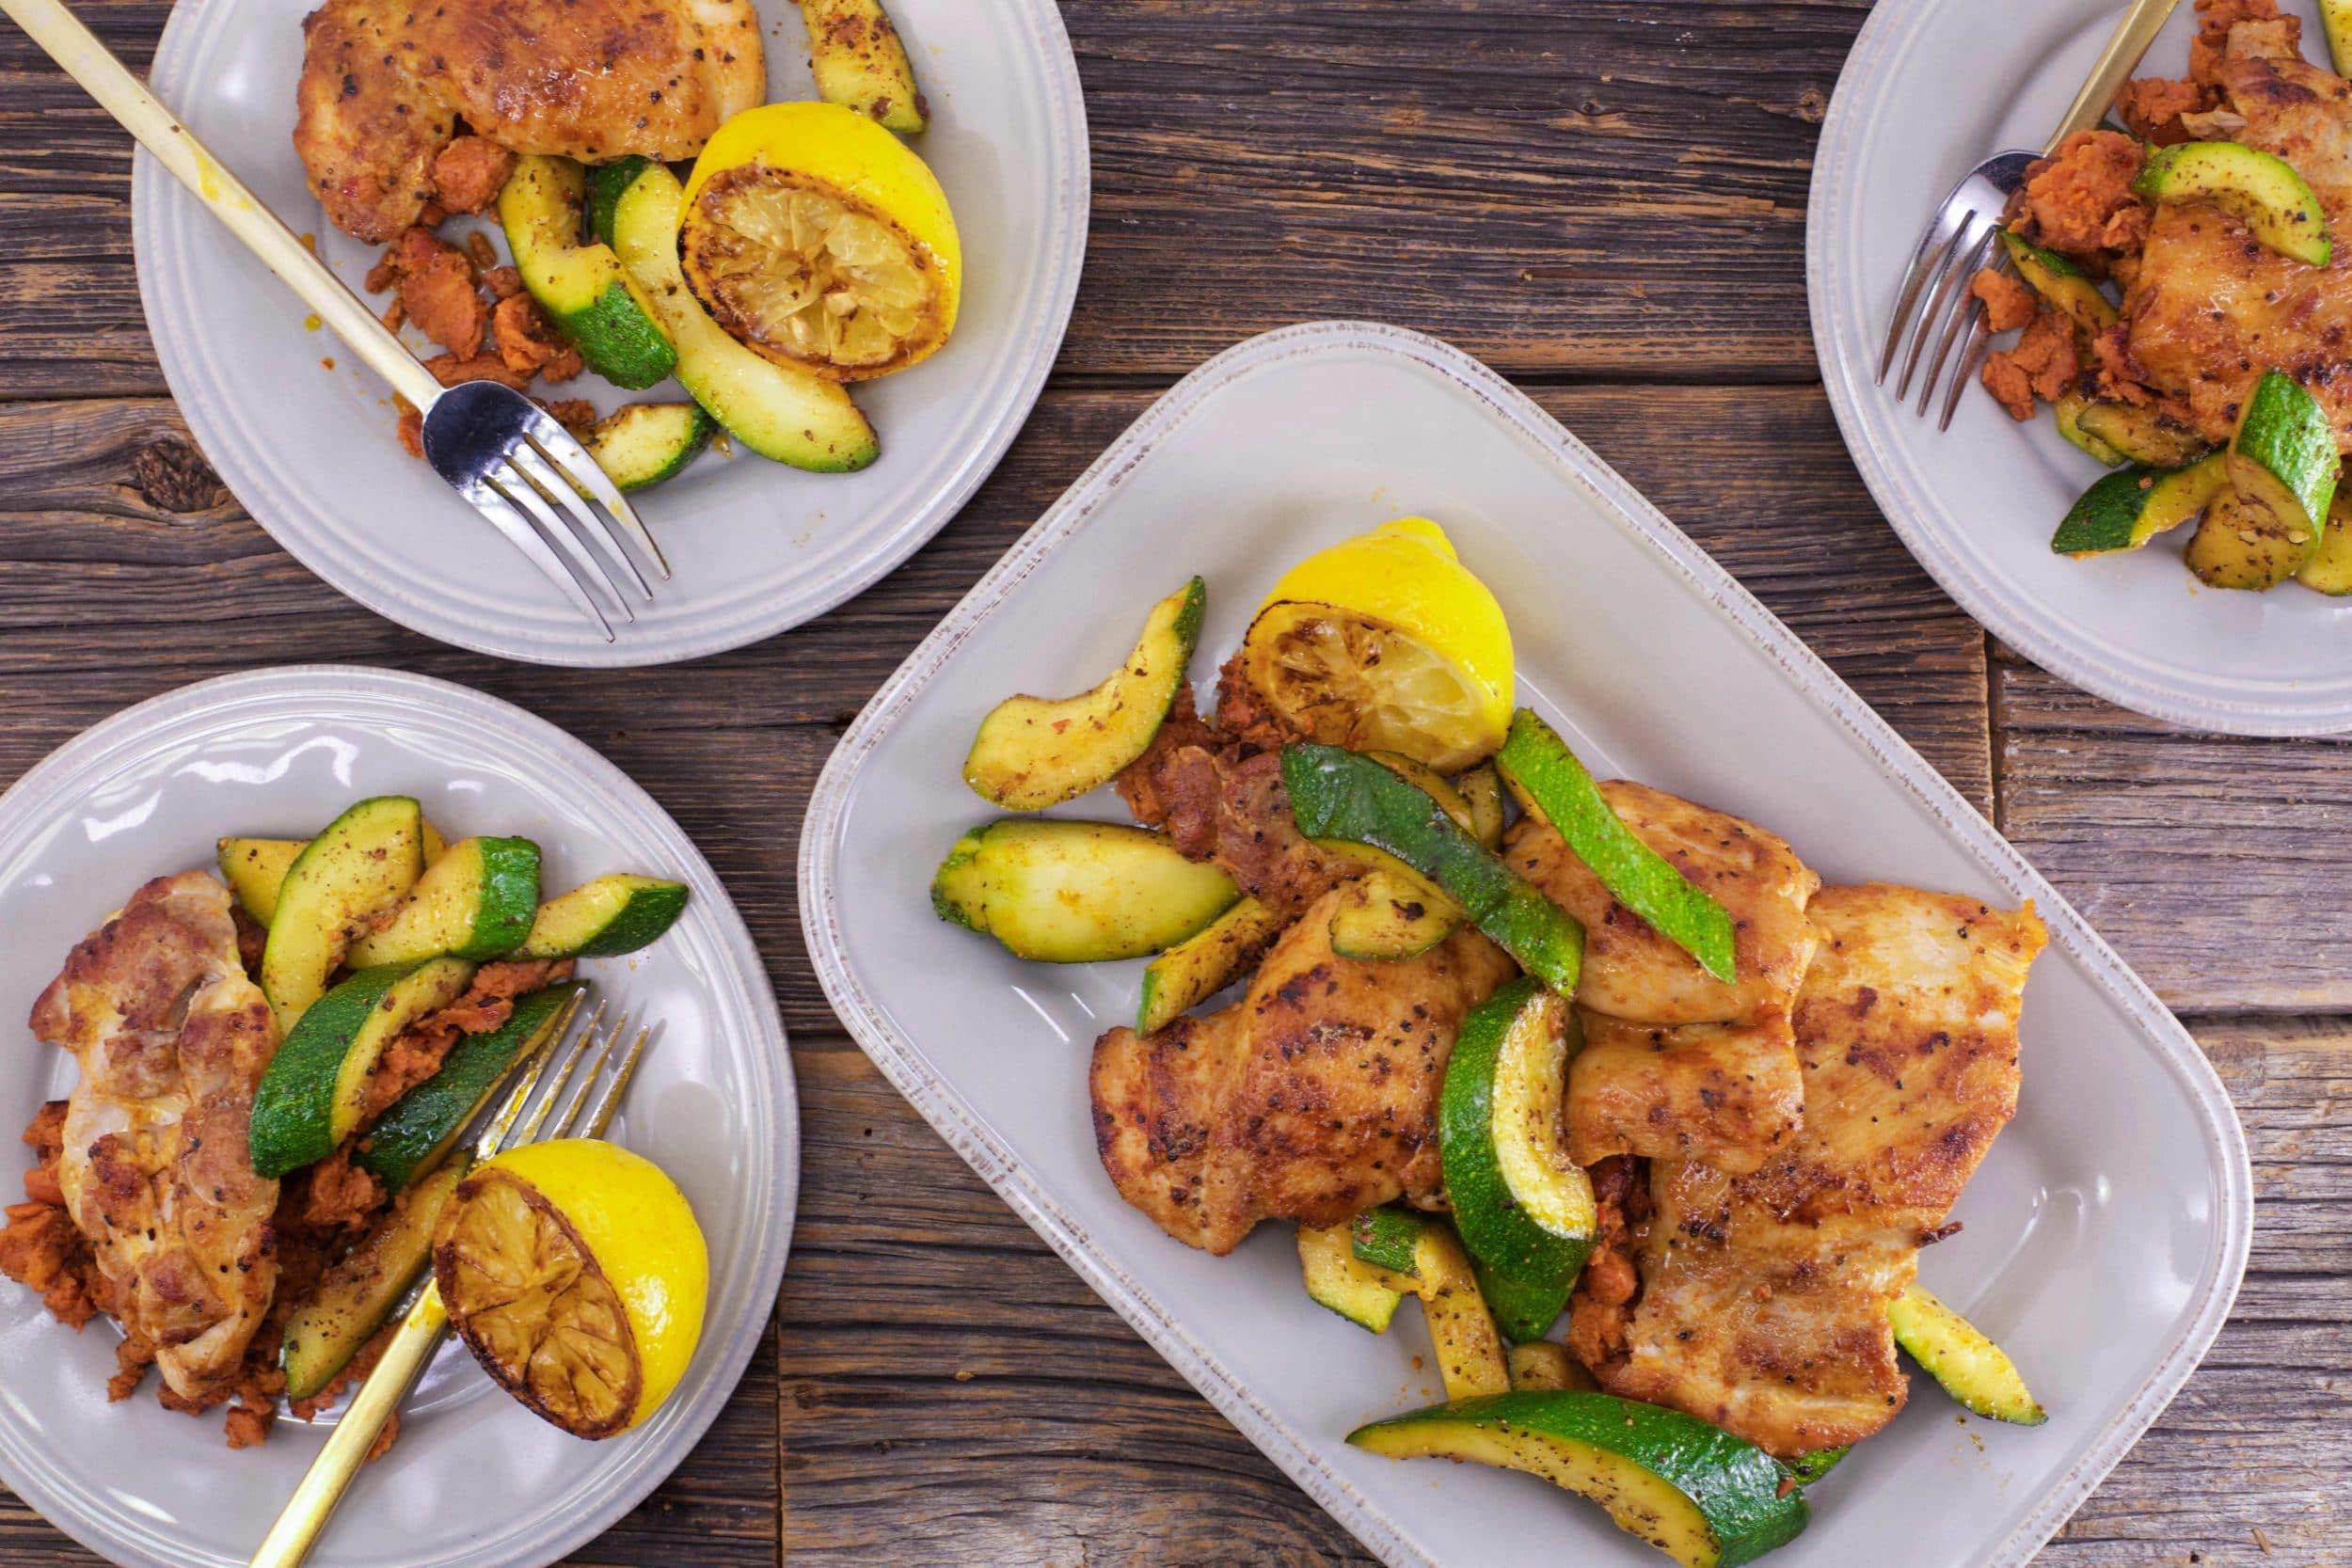 Smoky Chicken Thighs and Zucchini